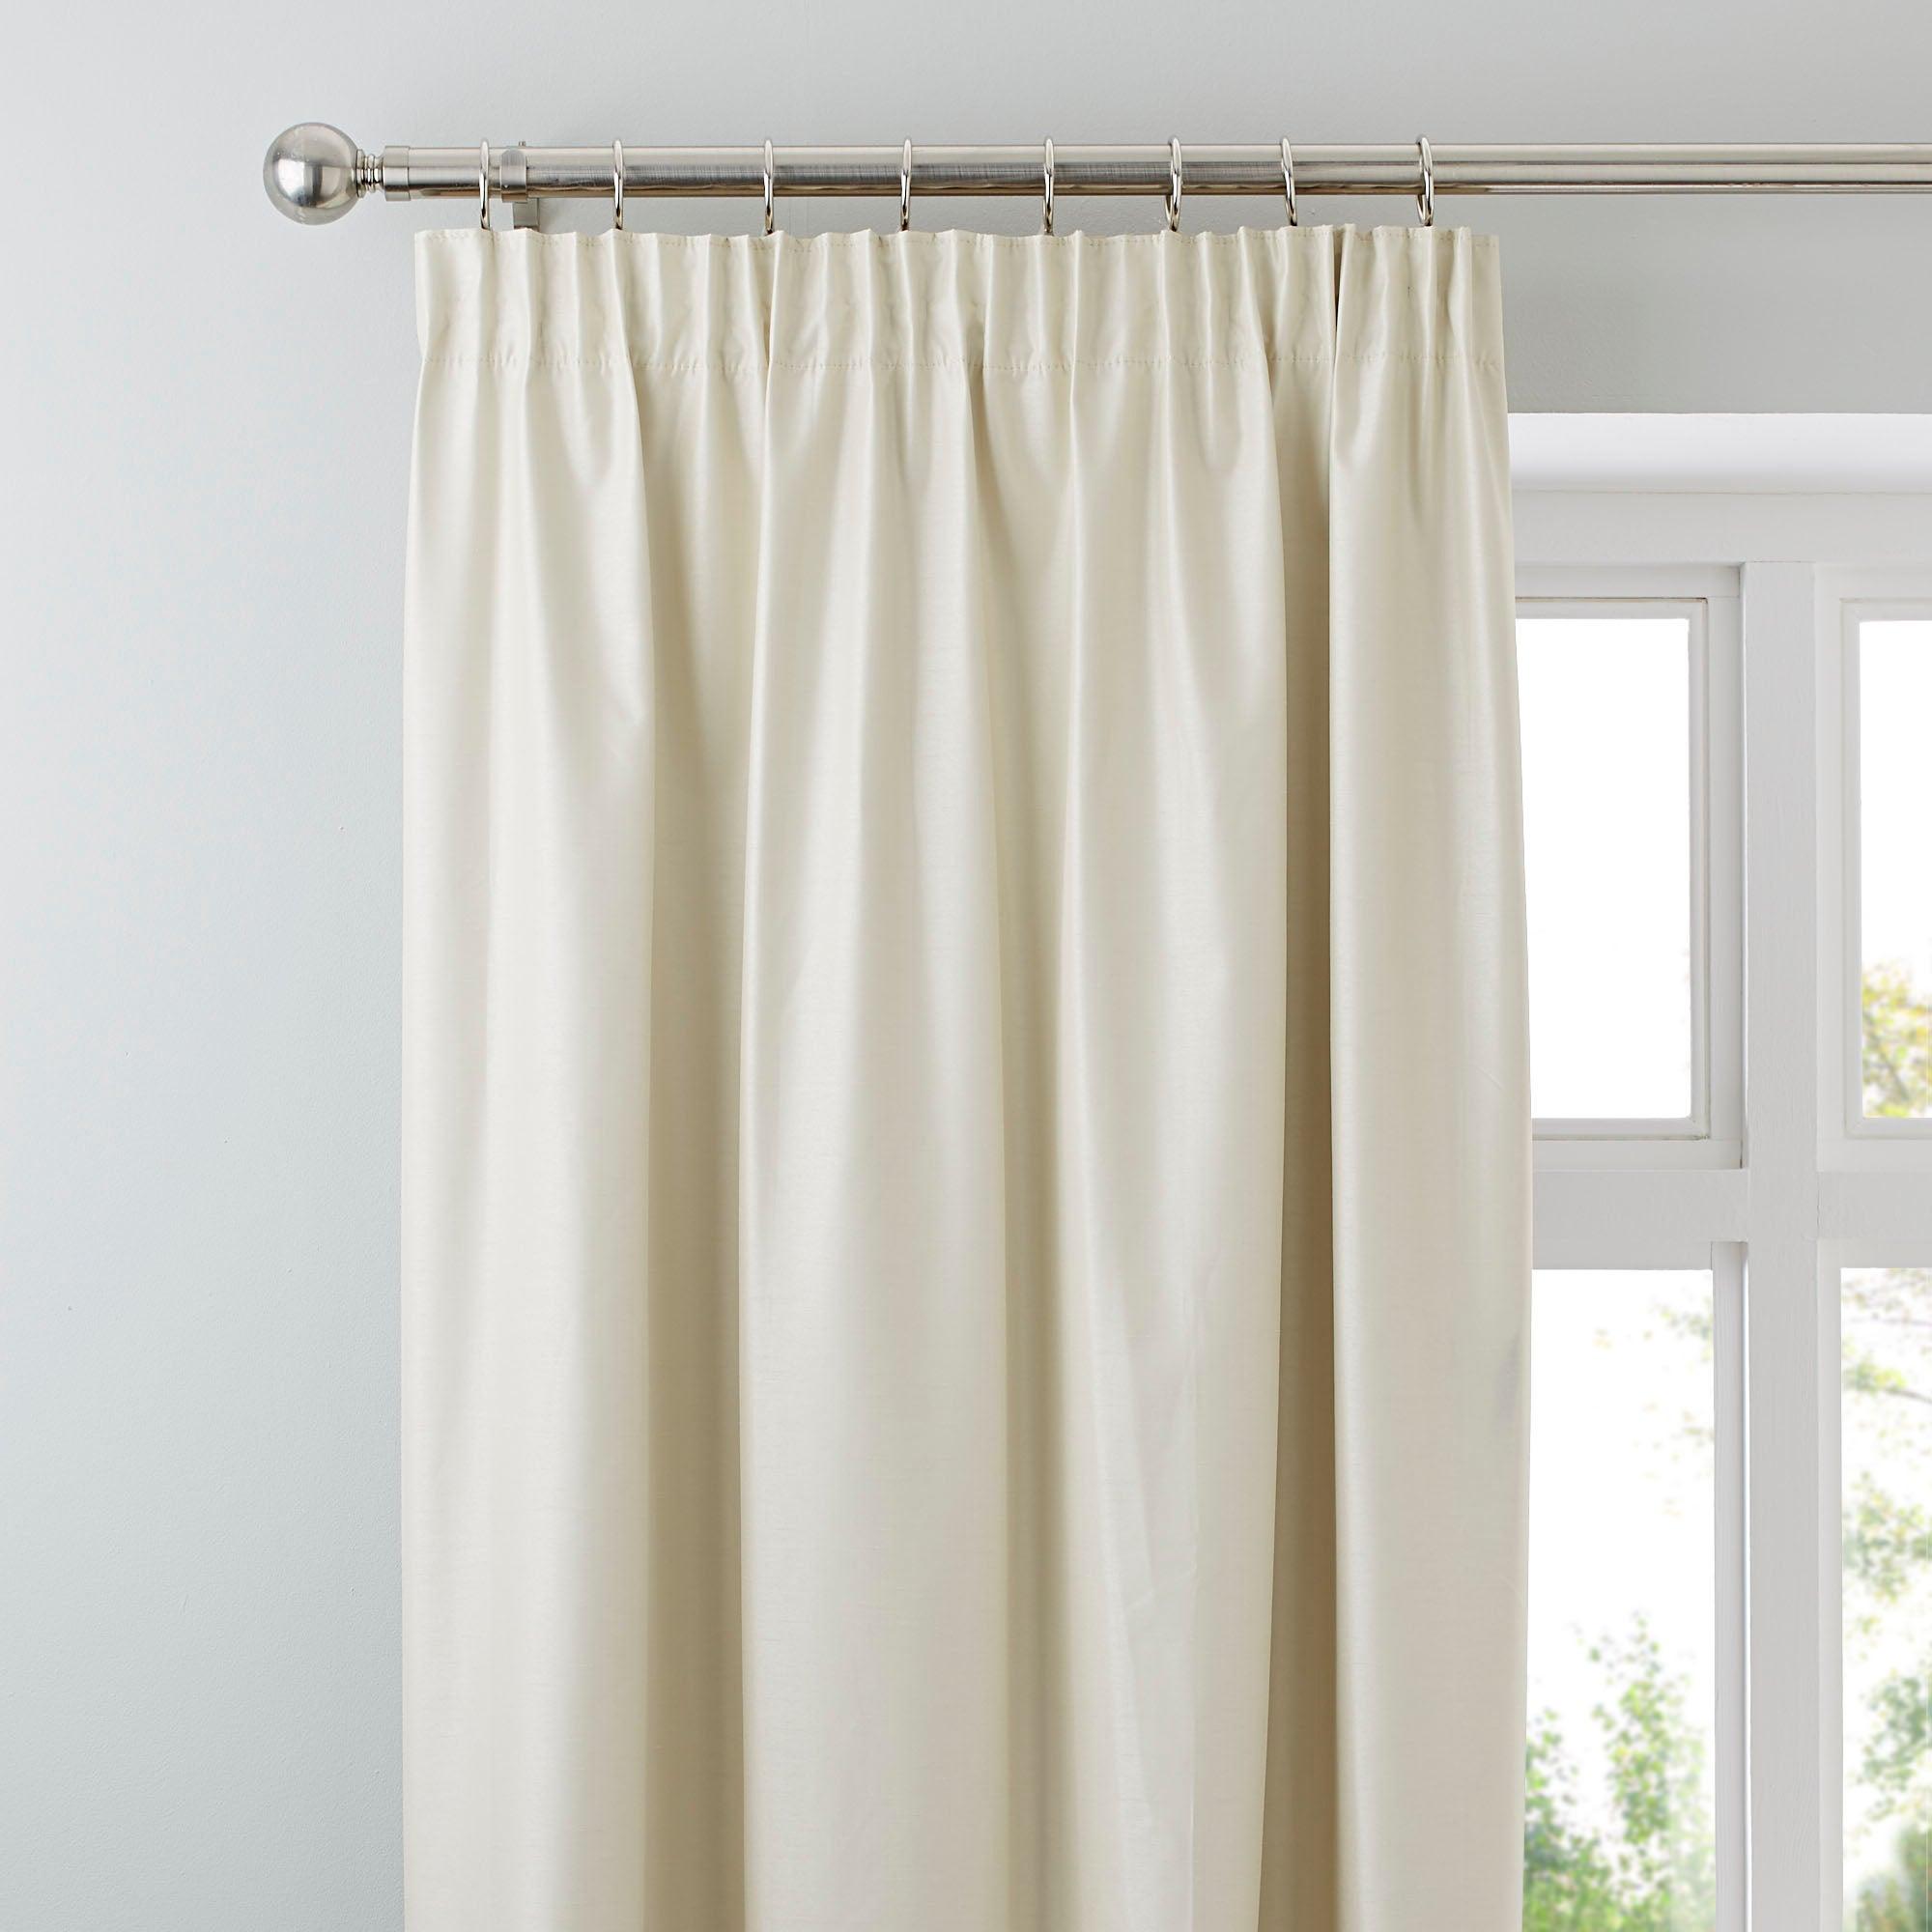 Photo of Nova natural blackout pencil pleat curtains light brown / natural